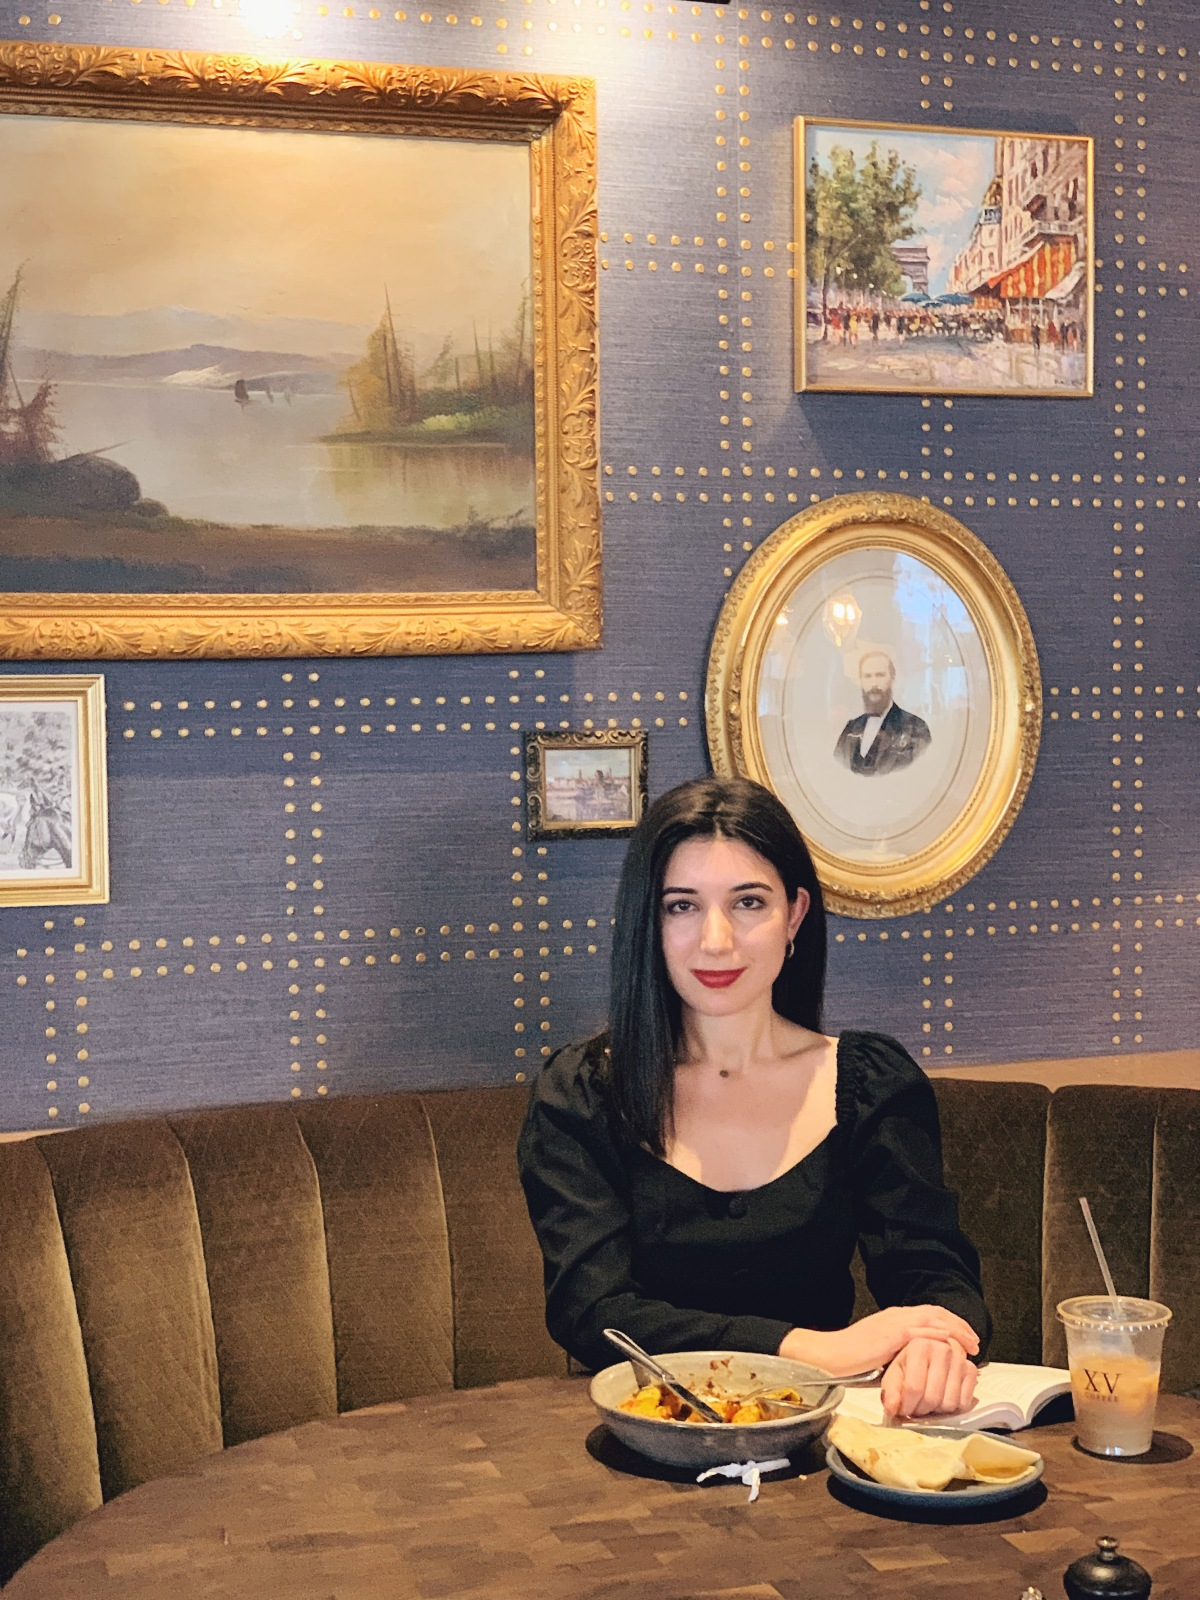 The Henry, coffee shops, best brunches in LA, Southern California, Sunday Brunch, Bloggers who Brunch, LA blogger, lifestyle blogger, Los Angeles eats, LA eats, Los Angeles restaurants, LA breakfast